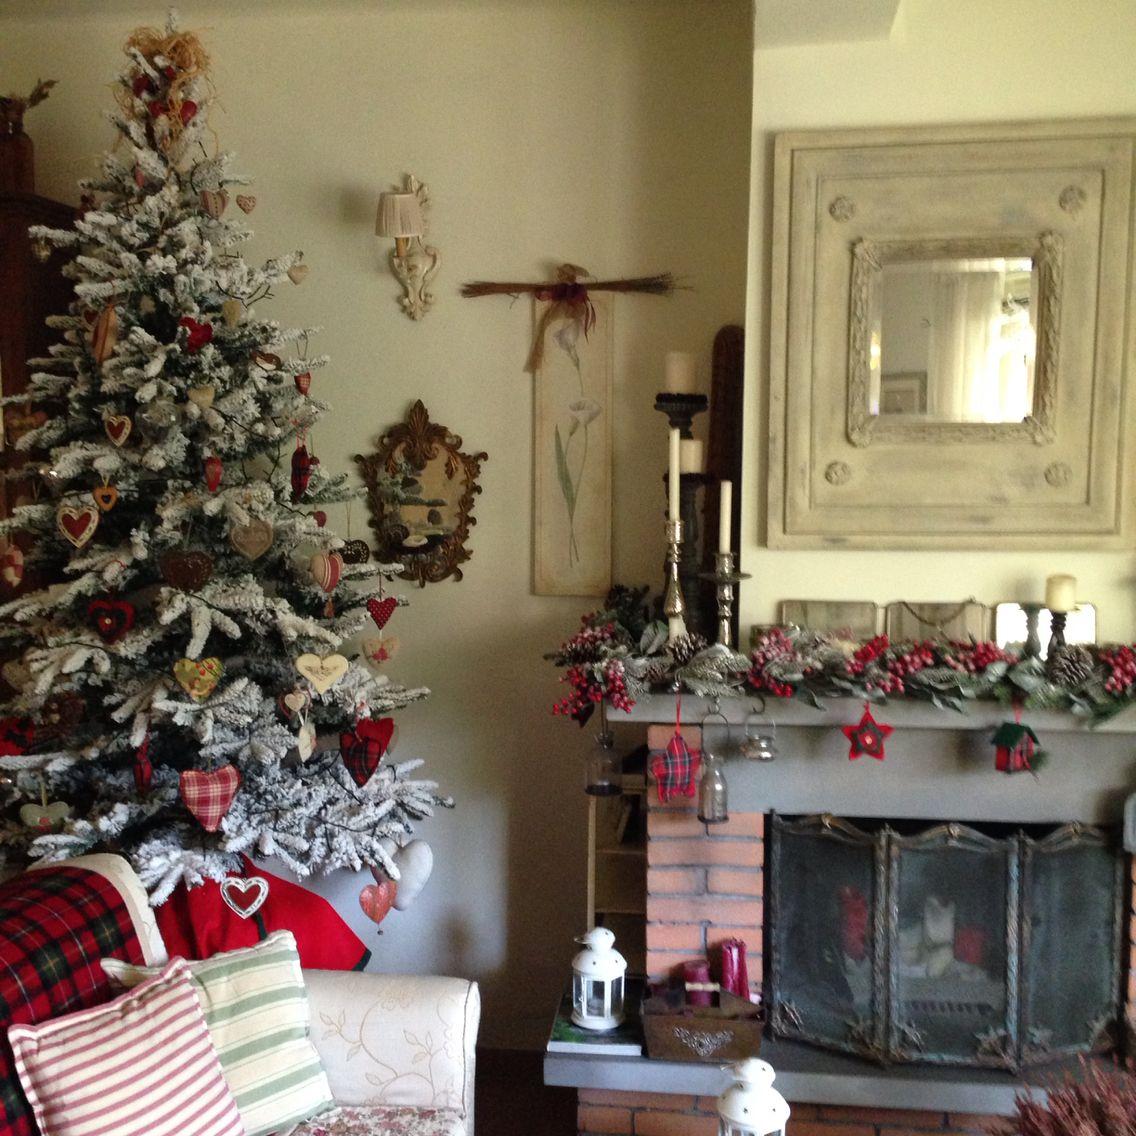 My warm Christmas